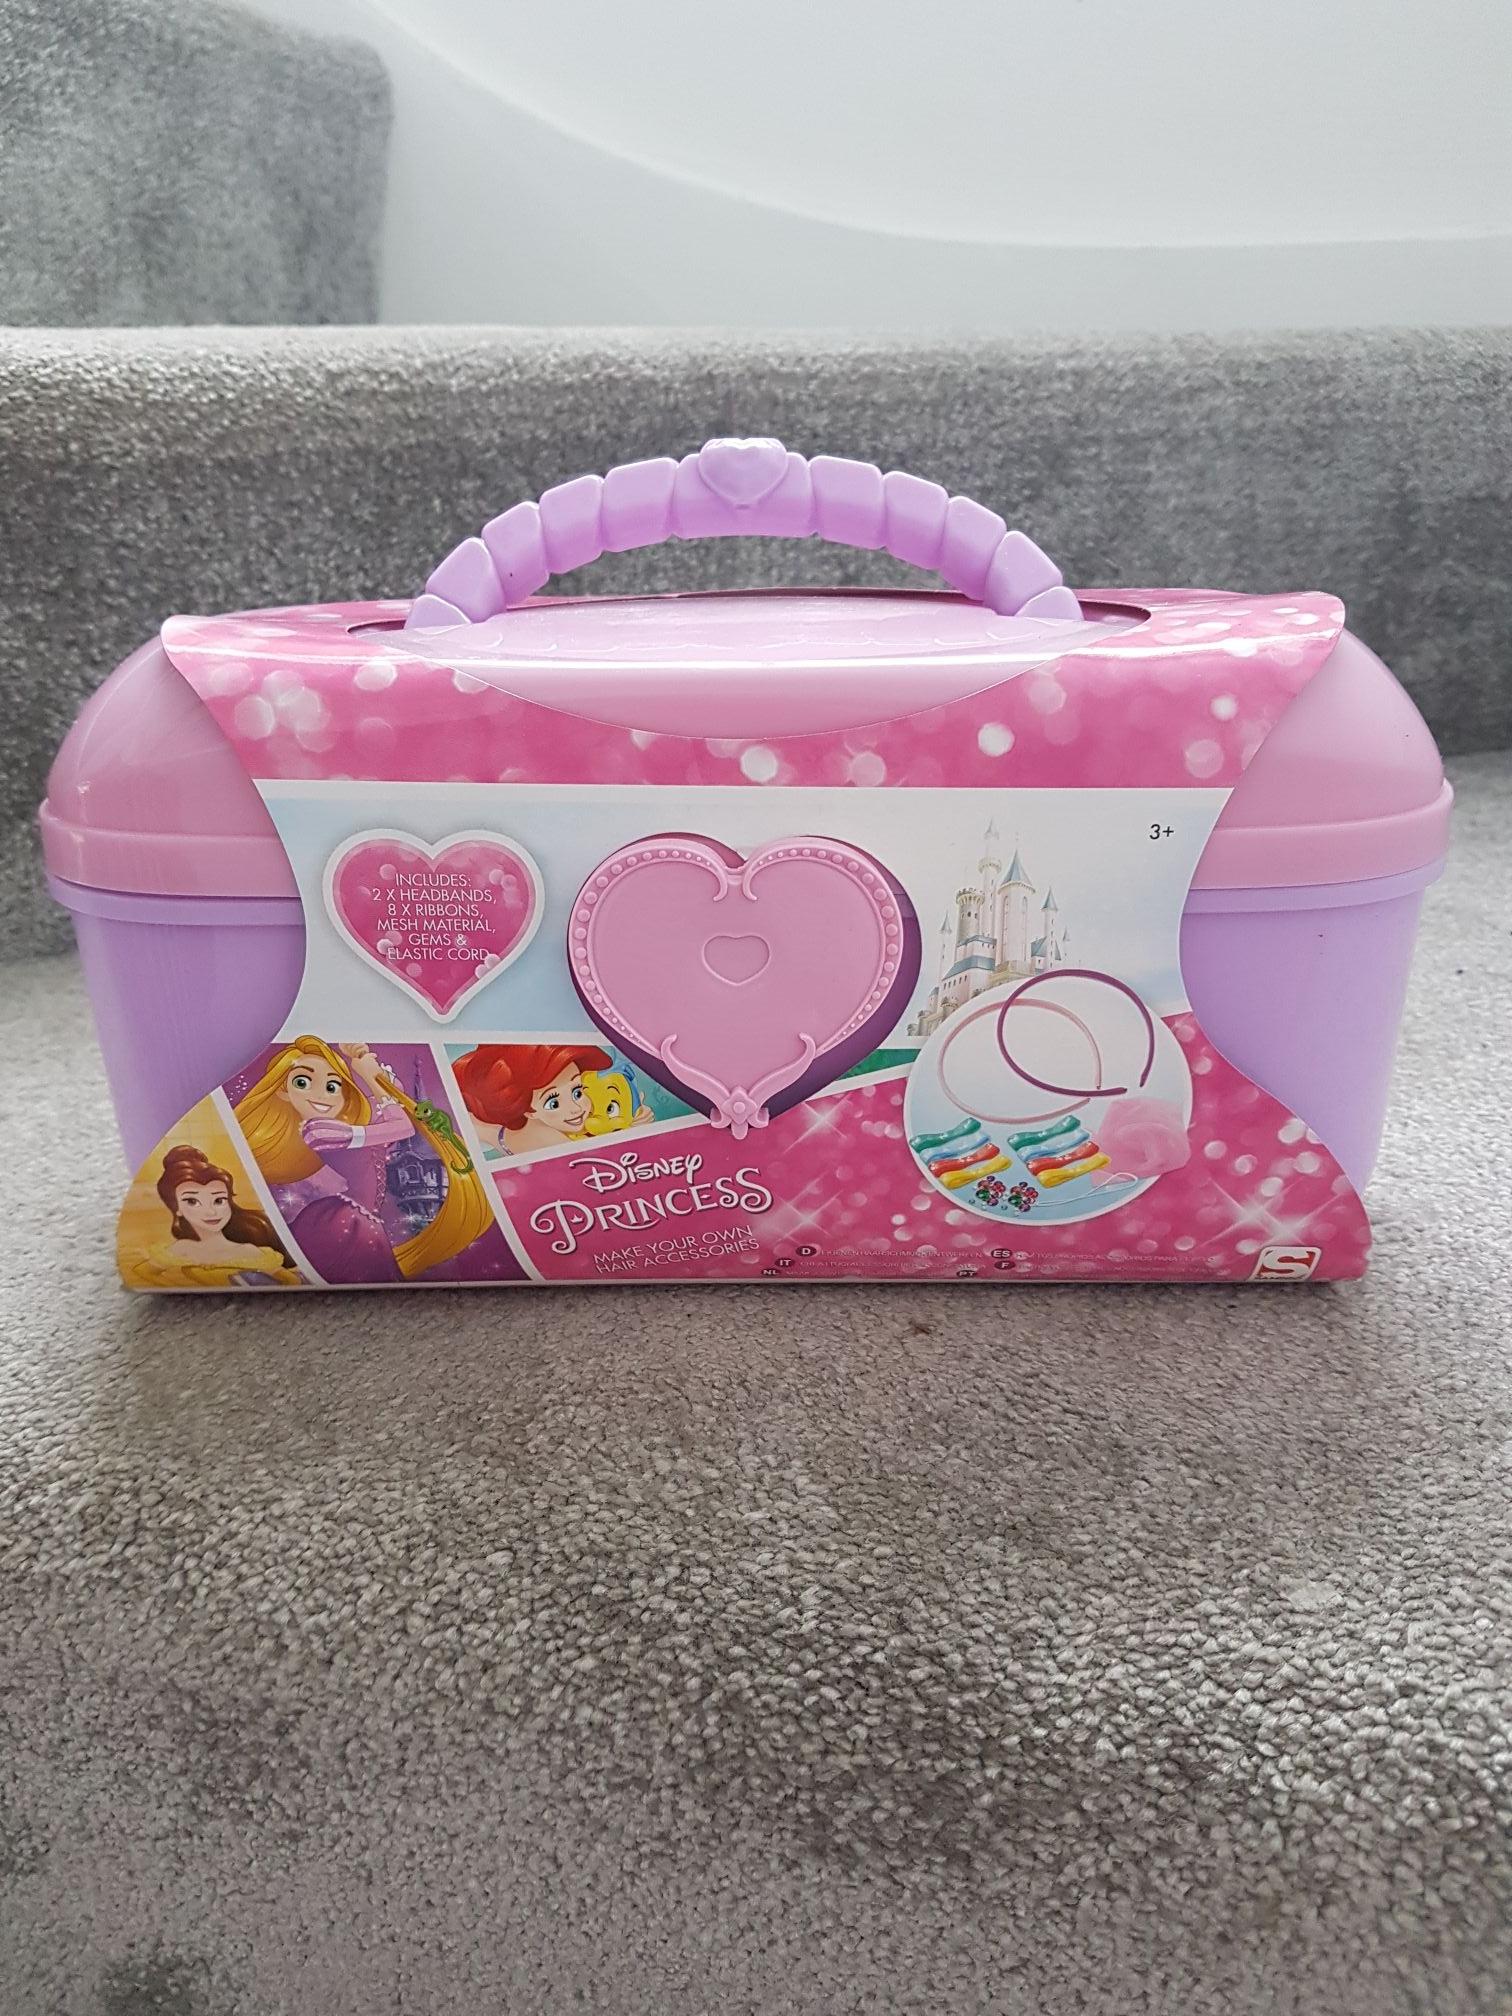 Disney princess vanity box £2.50 @ Tesco fforest fach, swansea. Perfect for a school birthday gift